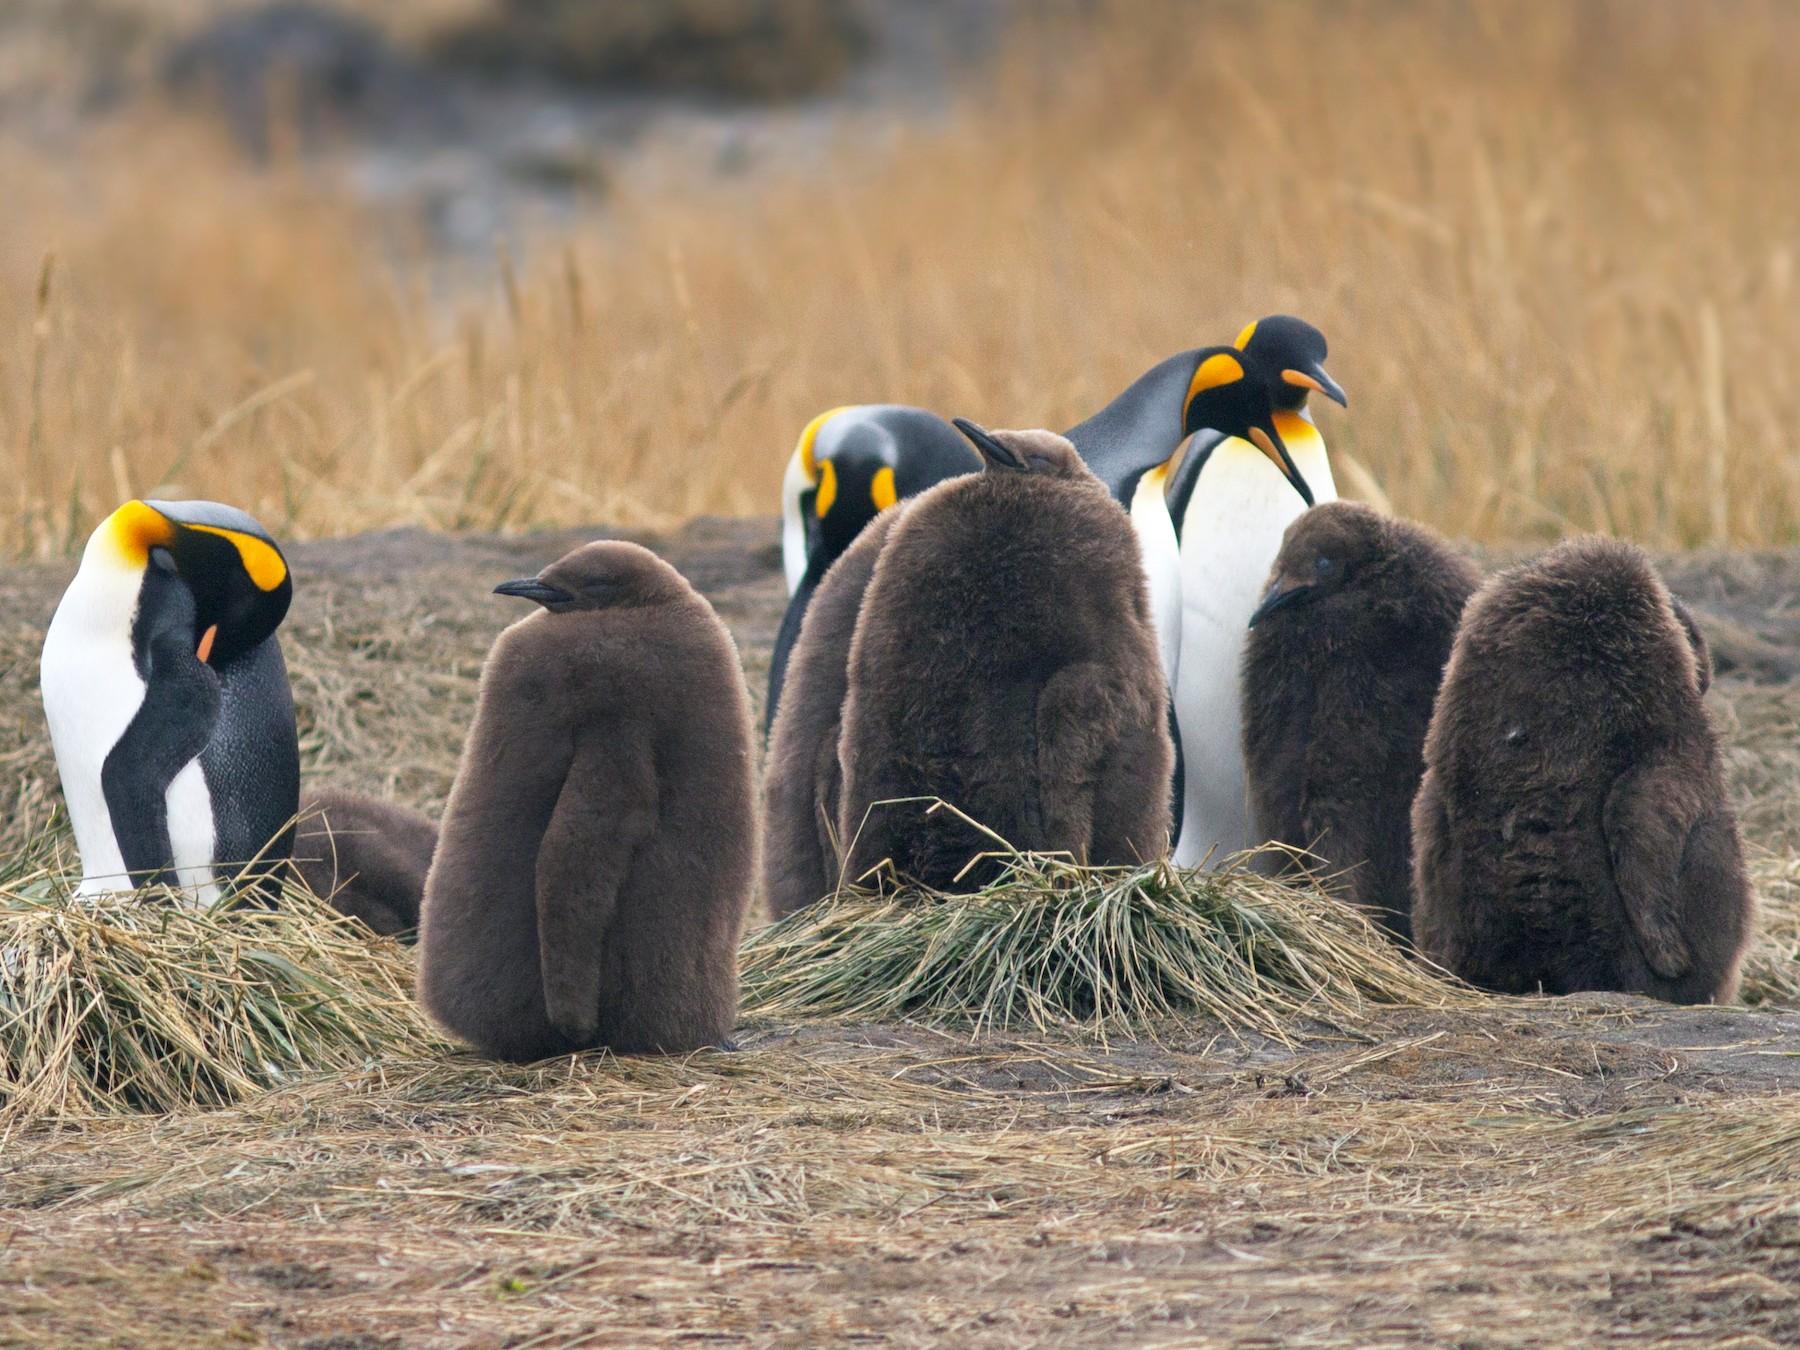 King Penguin - Fernando Medrano Martínez